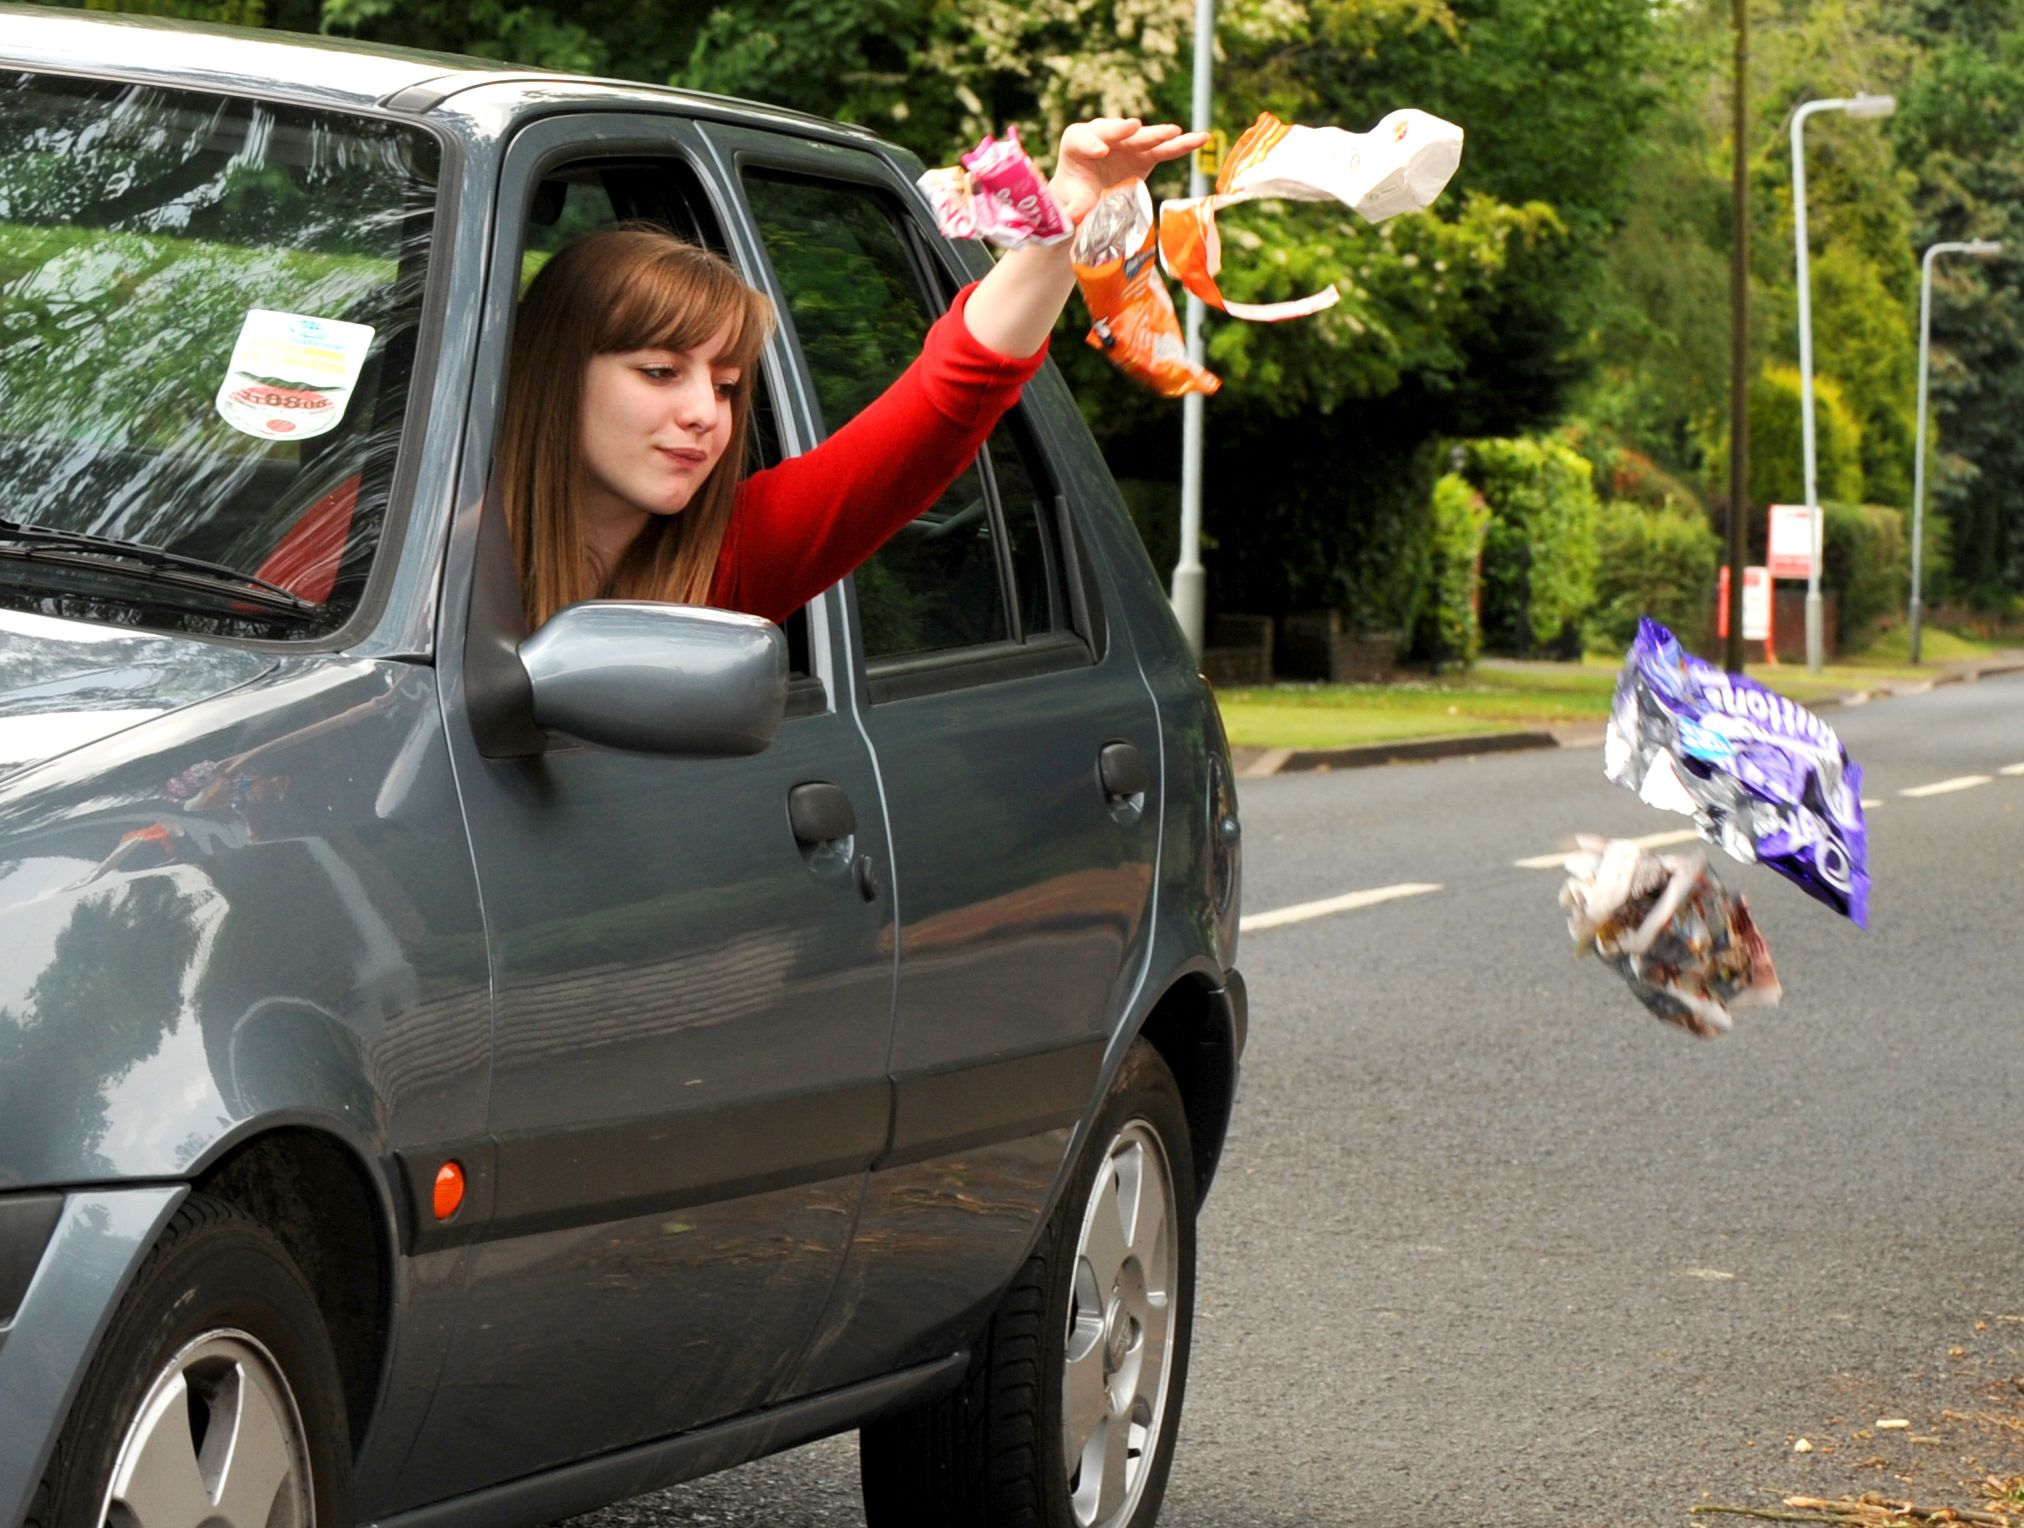 I hope her car is clean! :(